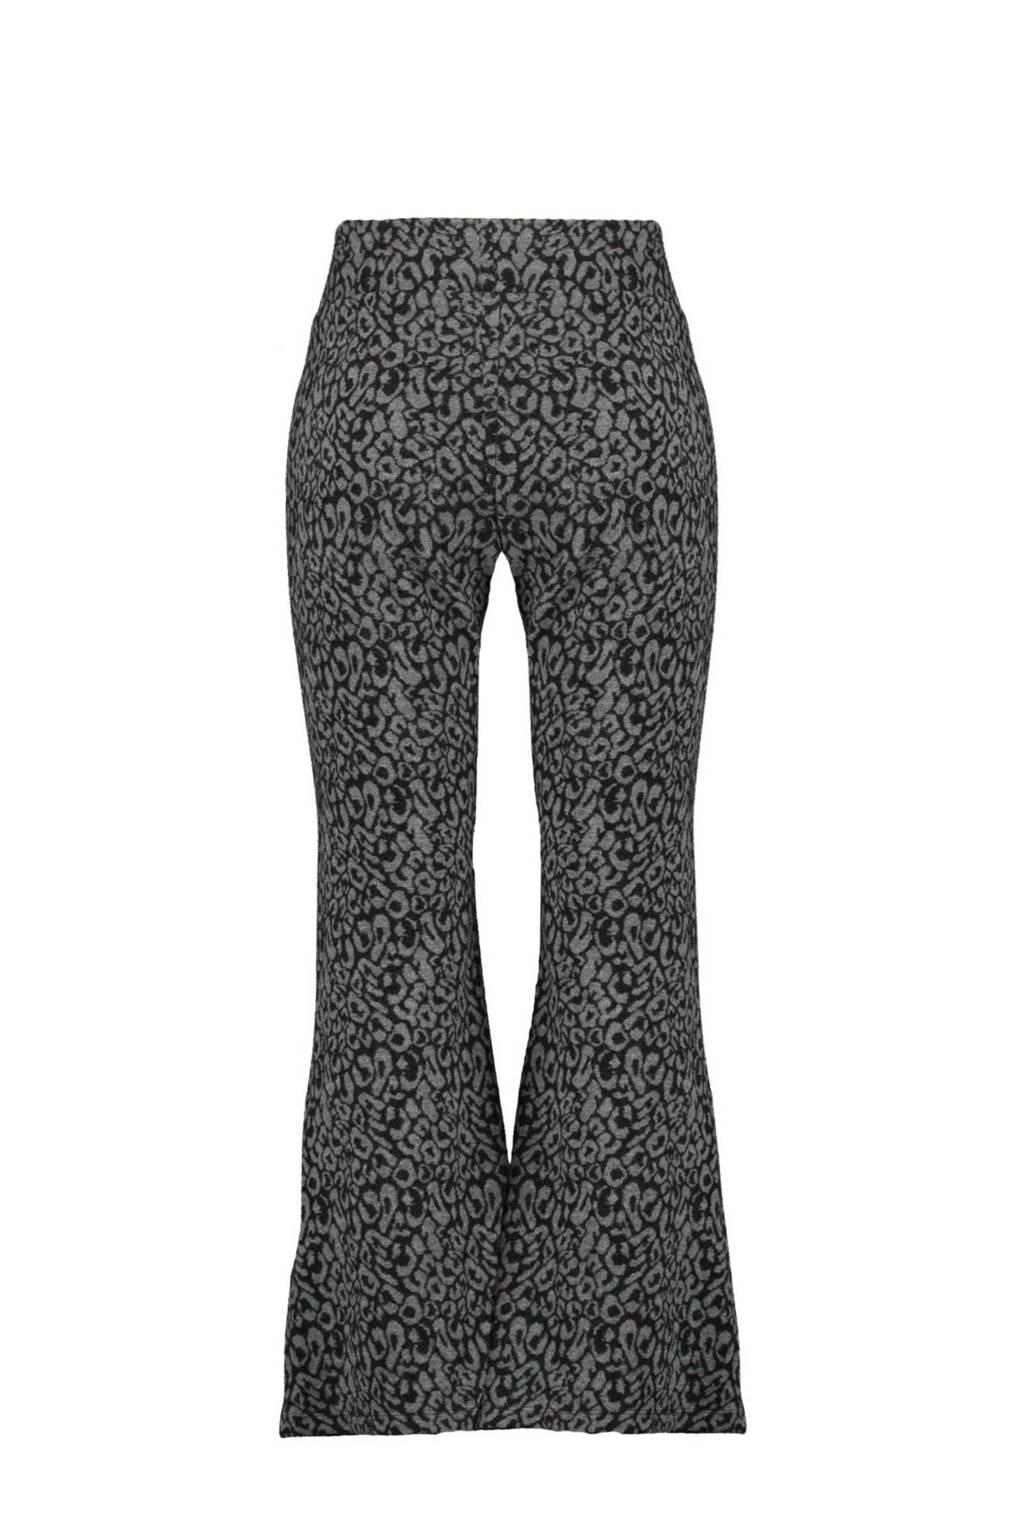 MS Mode Plus Size flared legging met panterprint grijs, Grijs